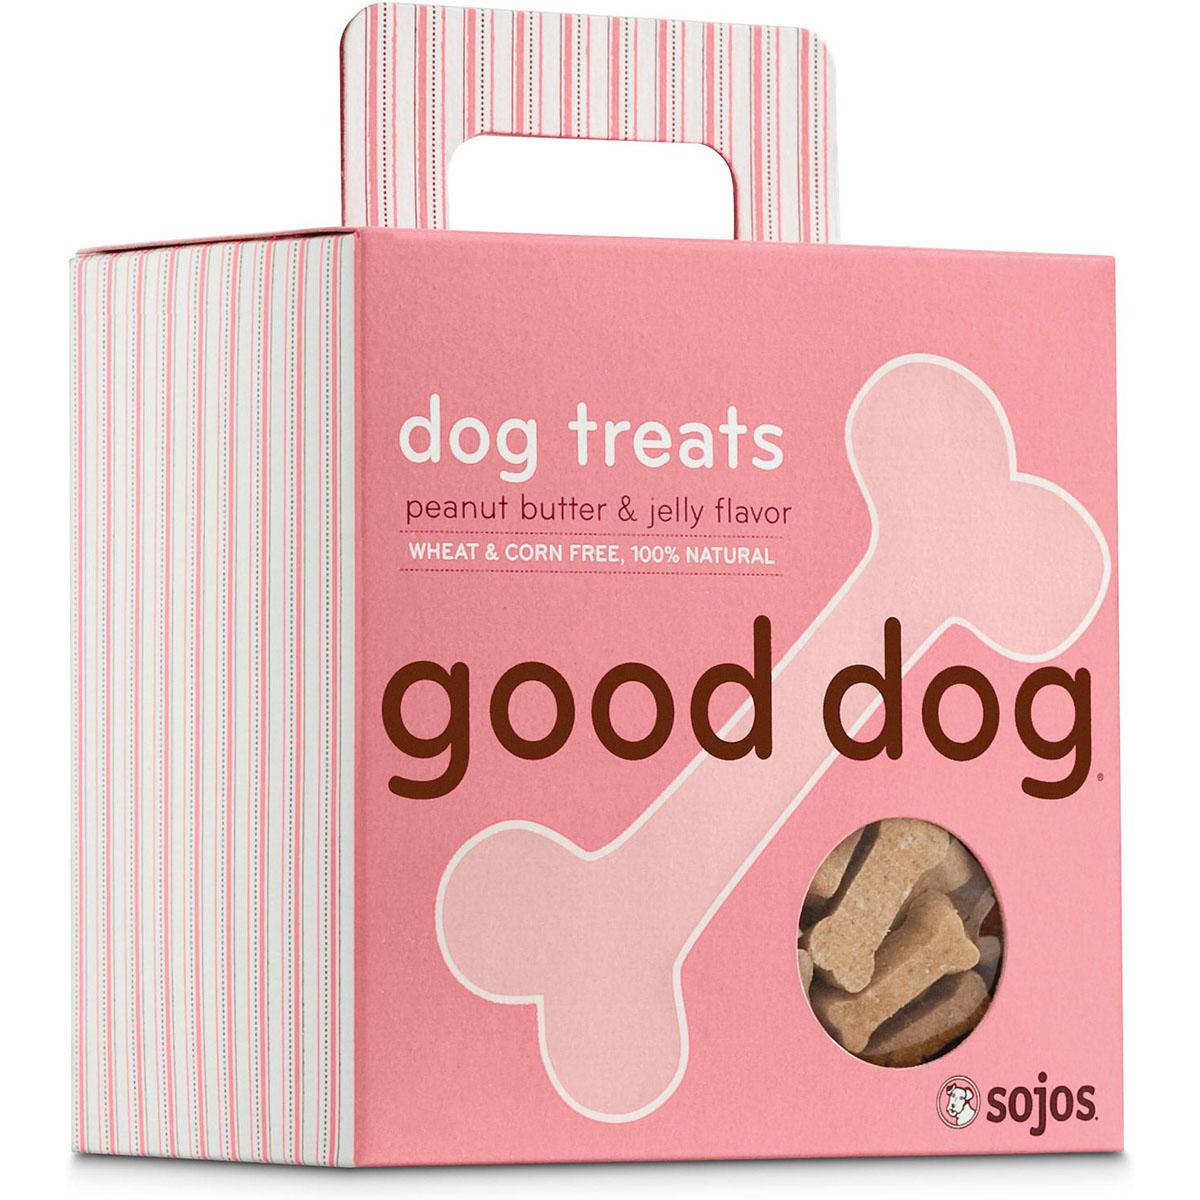 Sojos Good Dog Peanut Butter & Jelly Dog Treats